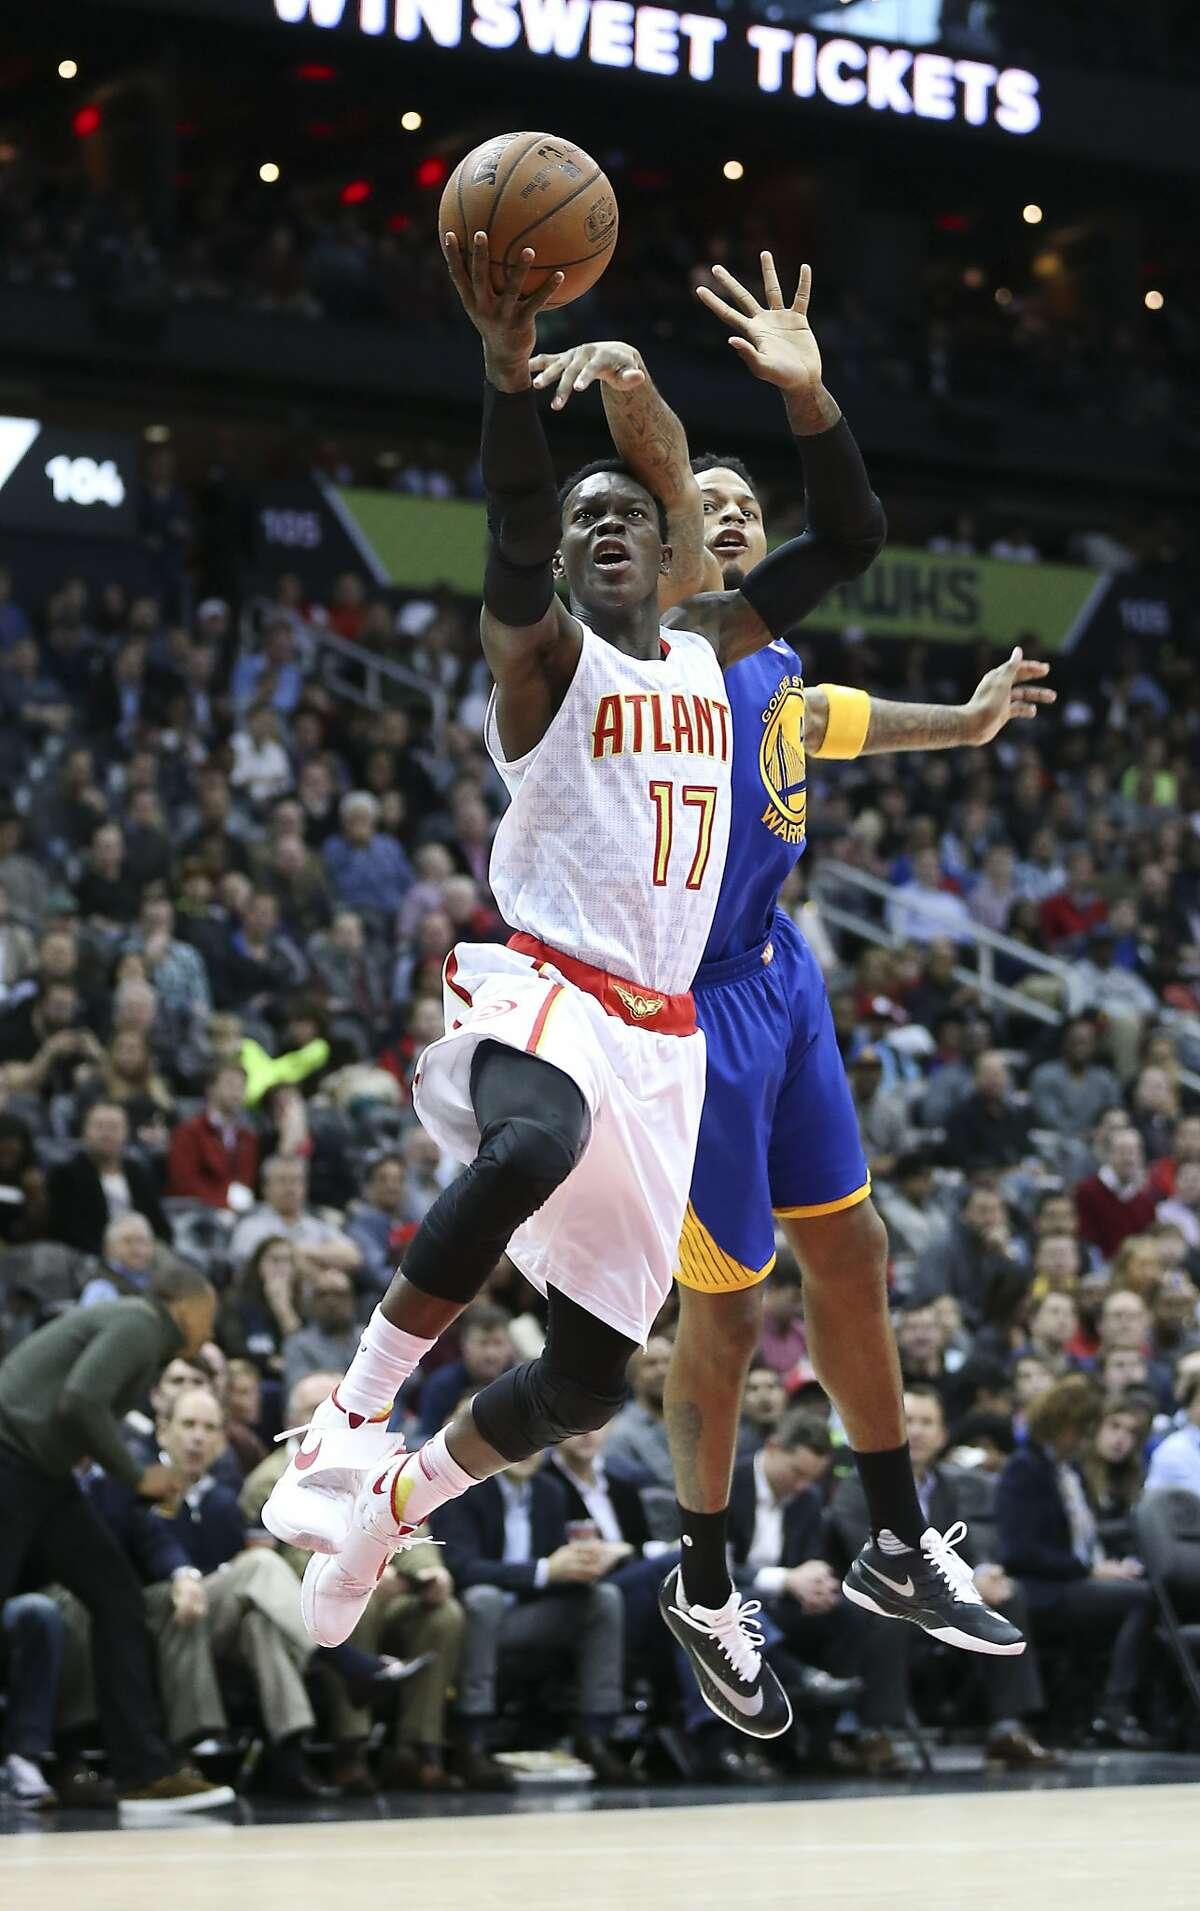 Atlanta Hawks guard Dennis Schroder (17) shoots as Golden State Warriors forward Brandon Rush (4) defends in the first half of an NBA basketball game Monday, Feb. 22, 2016, in Atlanta.